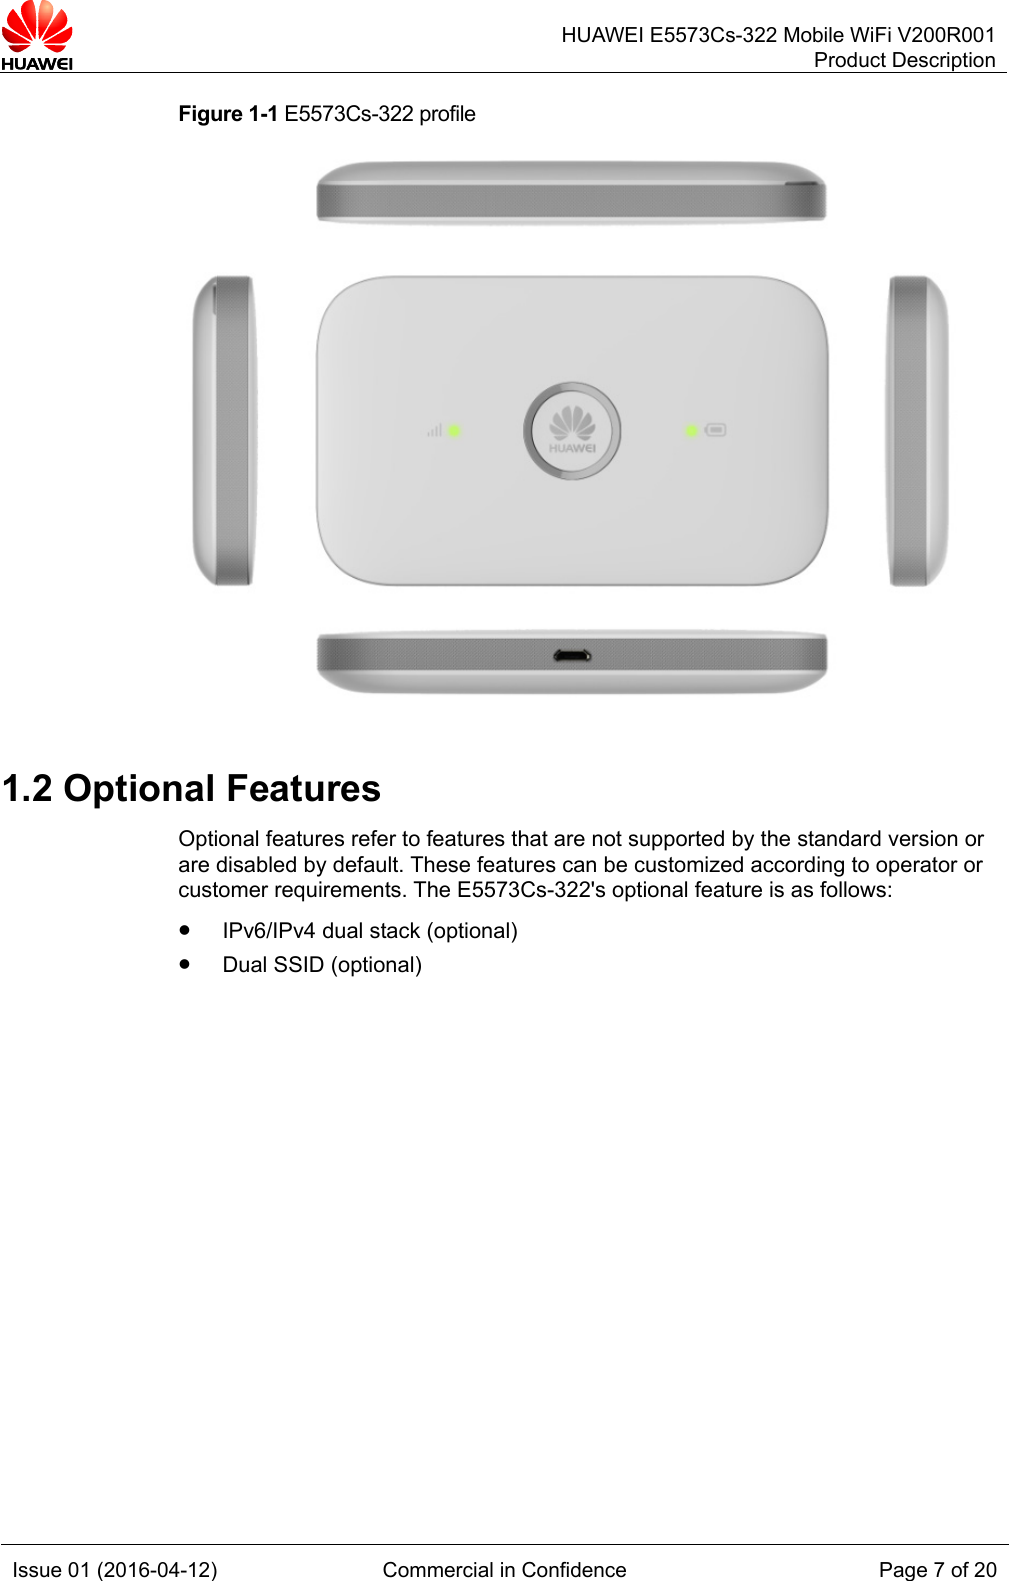 Huawei E5573Cs 322 Mobile WiFi Product Description _V200R001_01,EN_